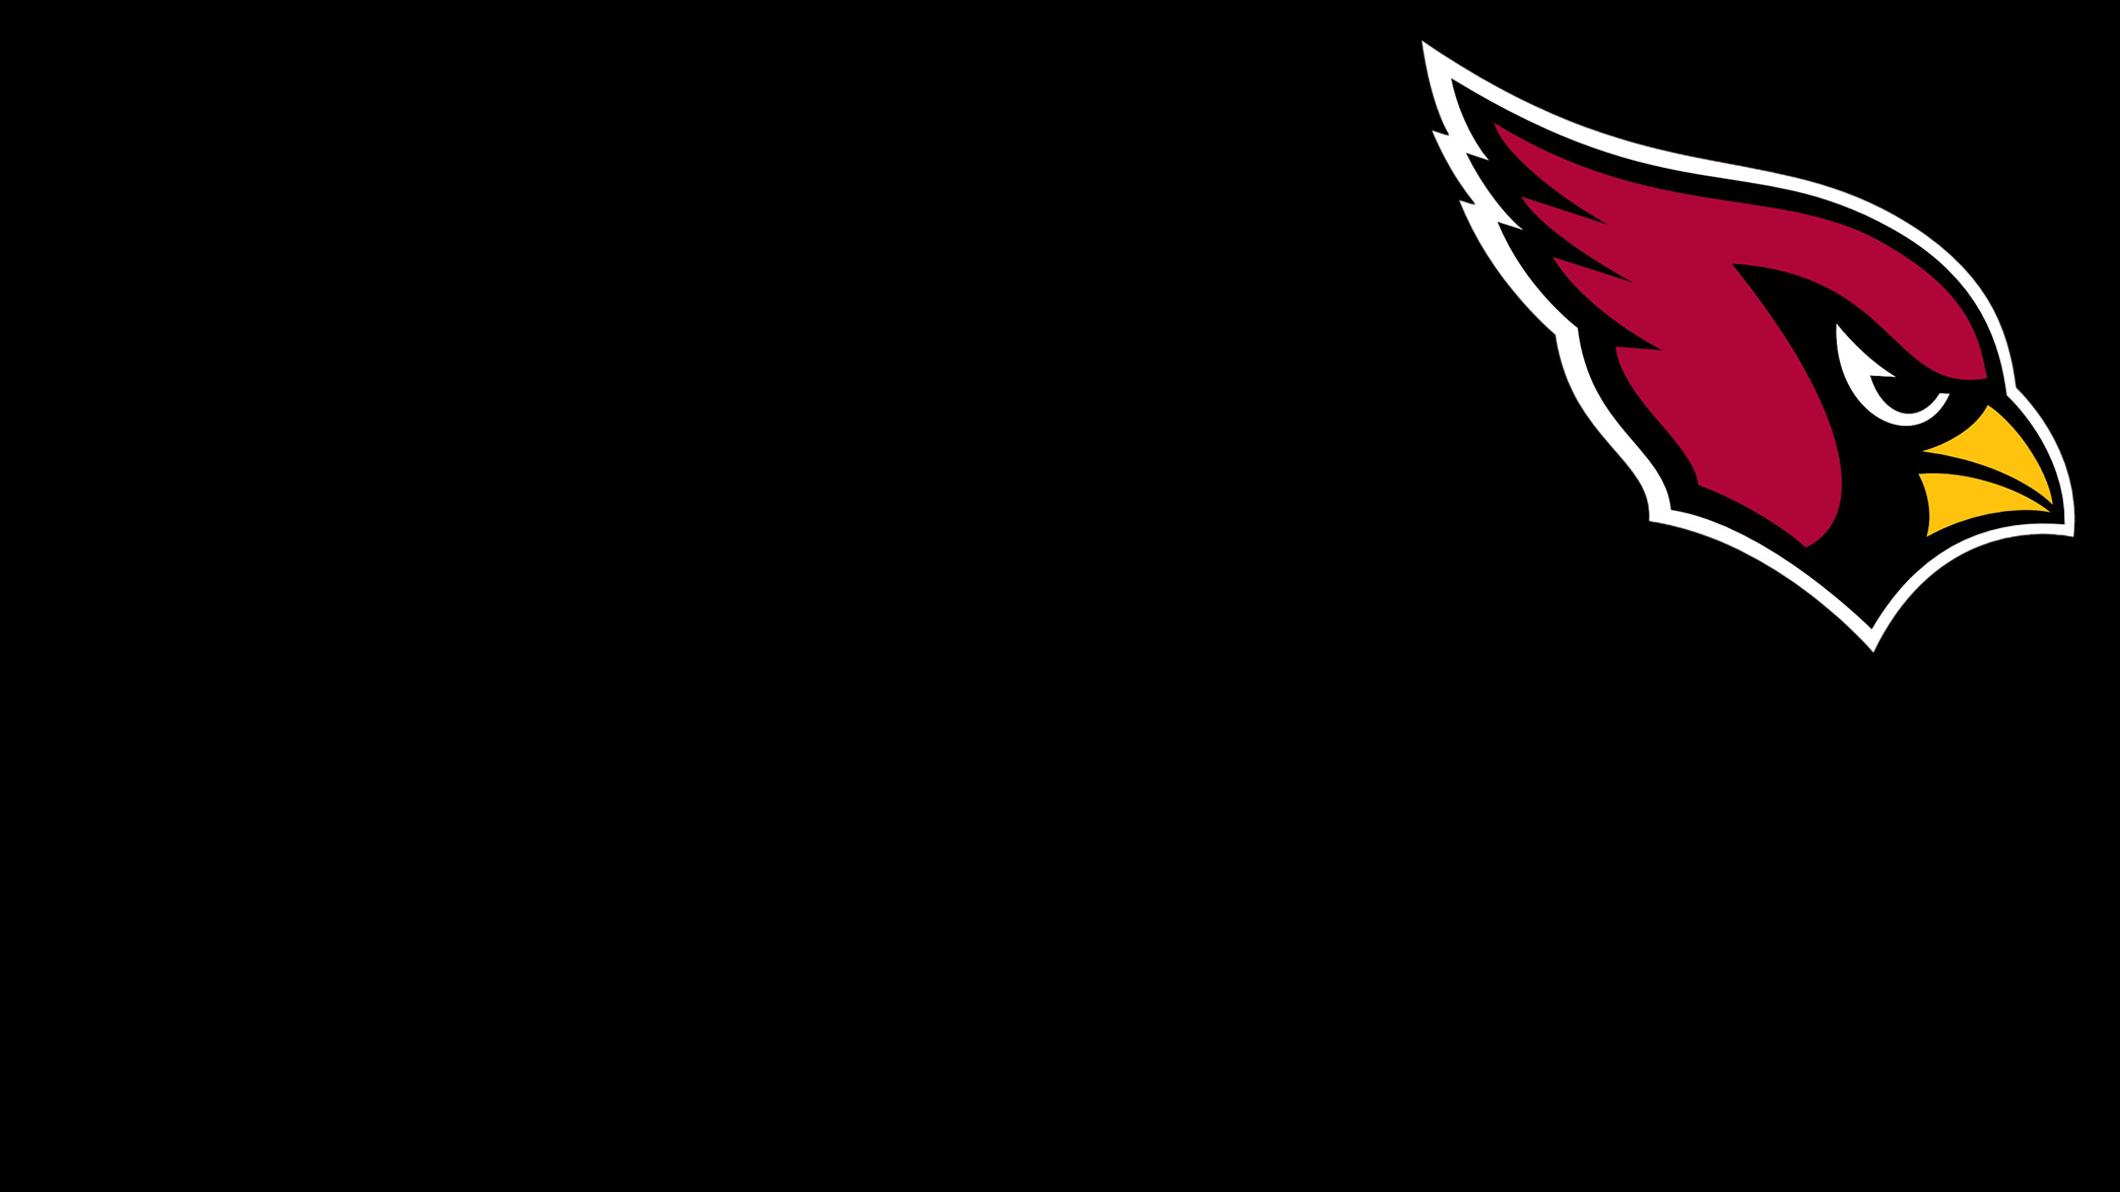 Arizona Cardinals Logo 7 Wallpaper Download Free Arizona